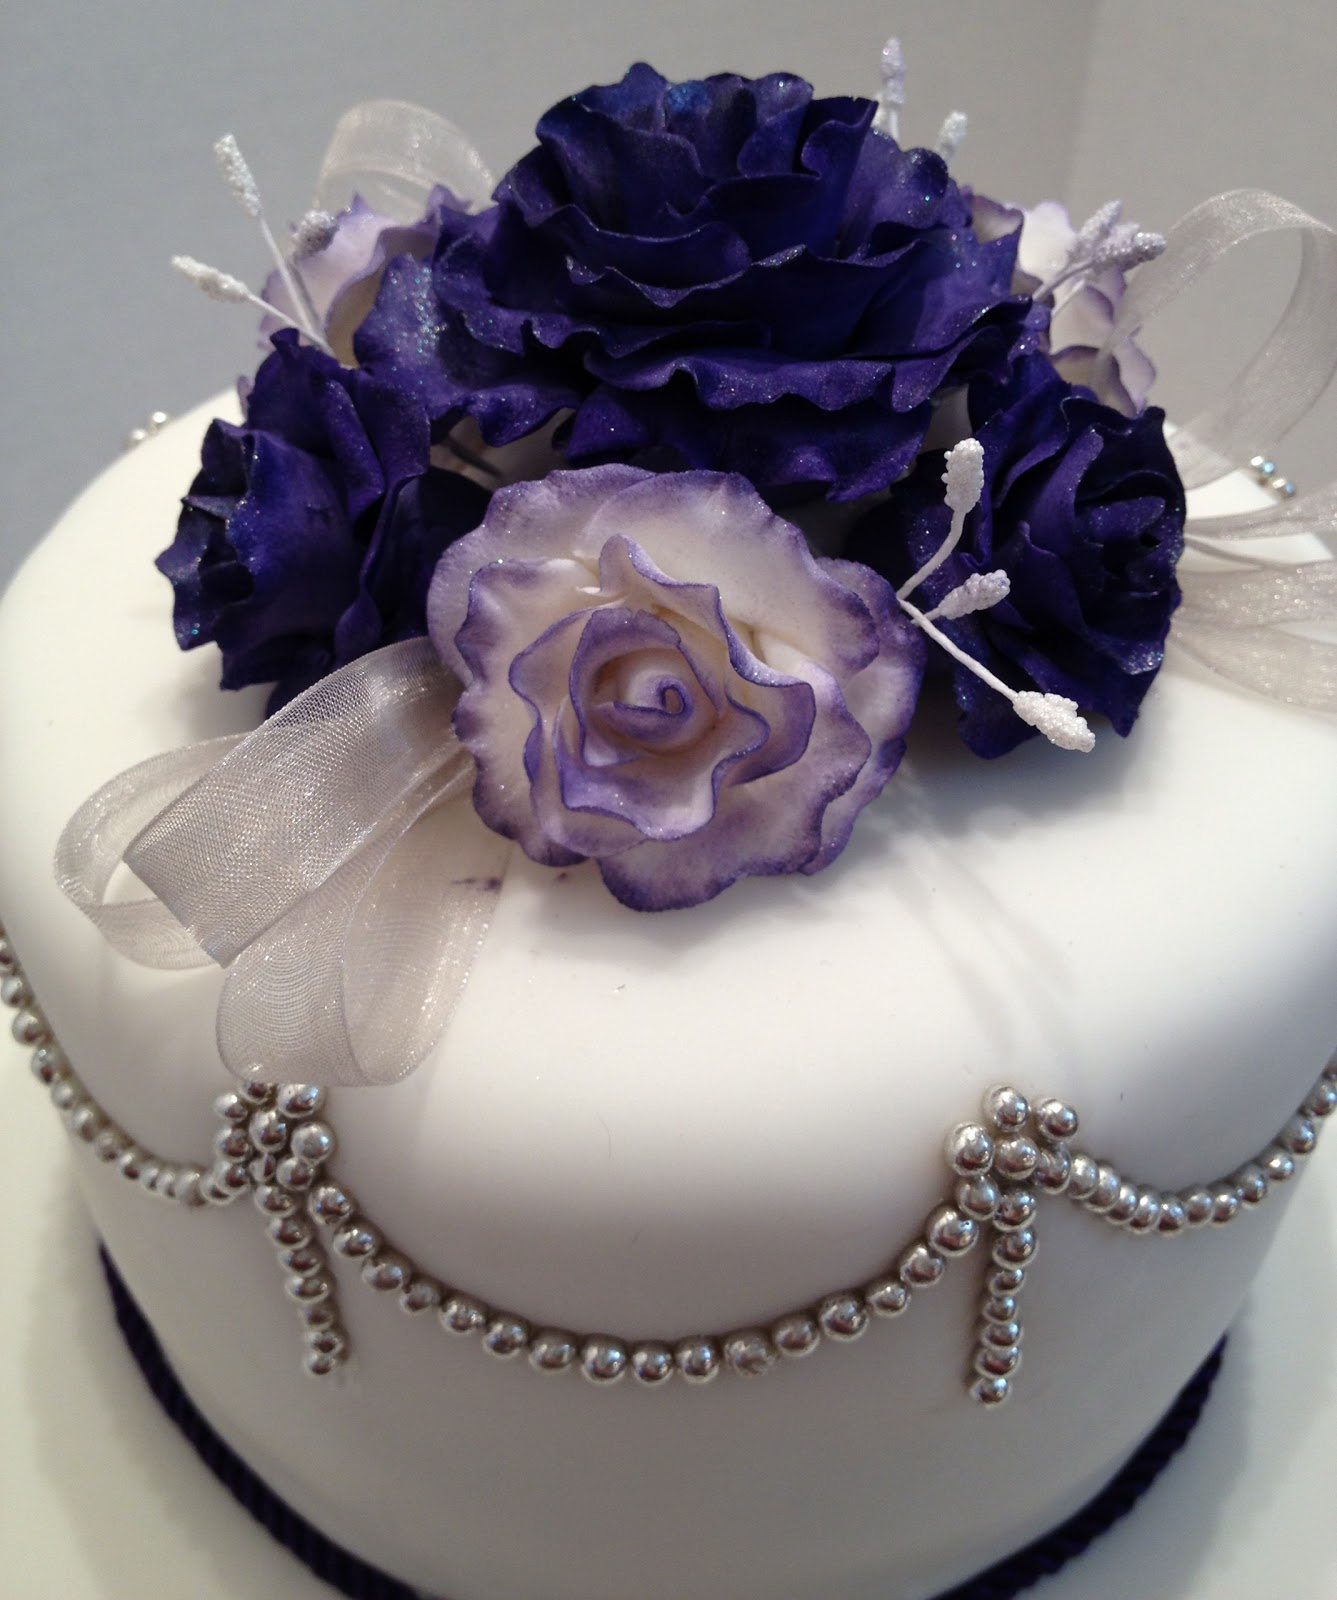 Artistic Cake Design Nut Free